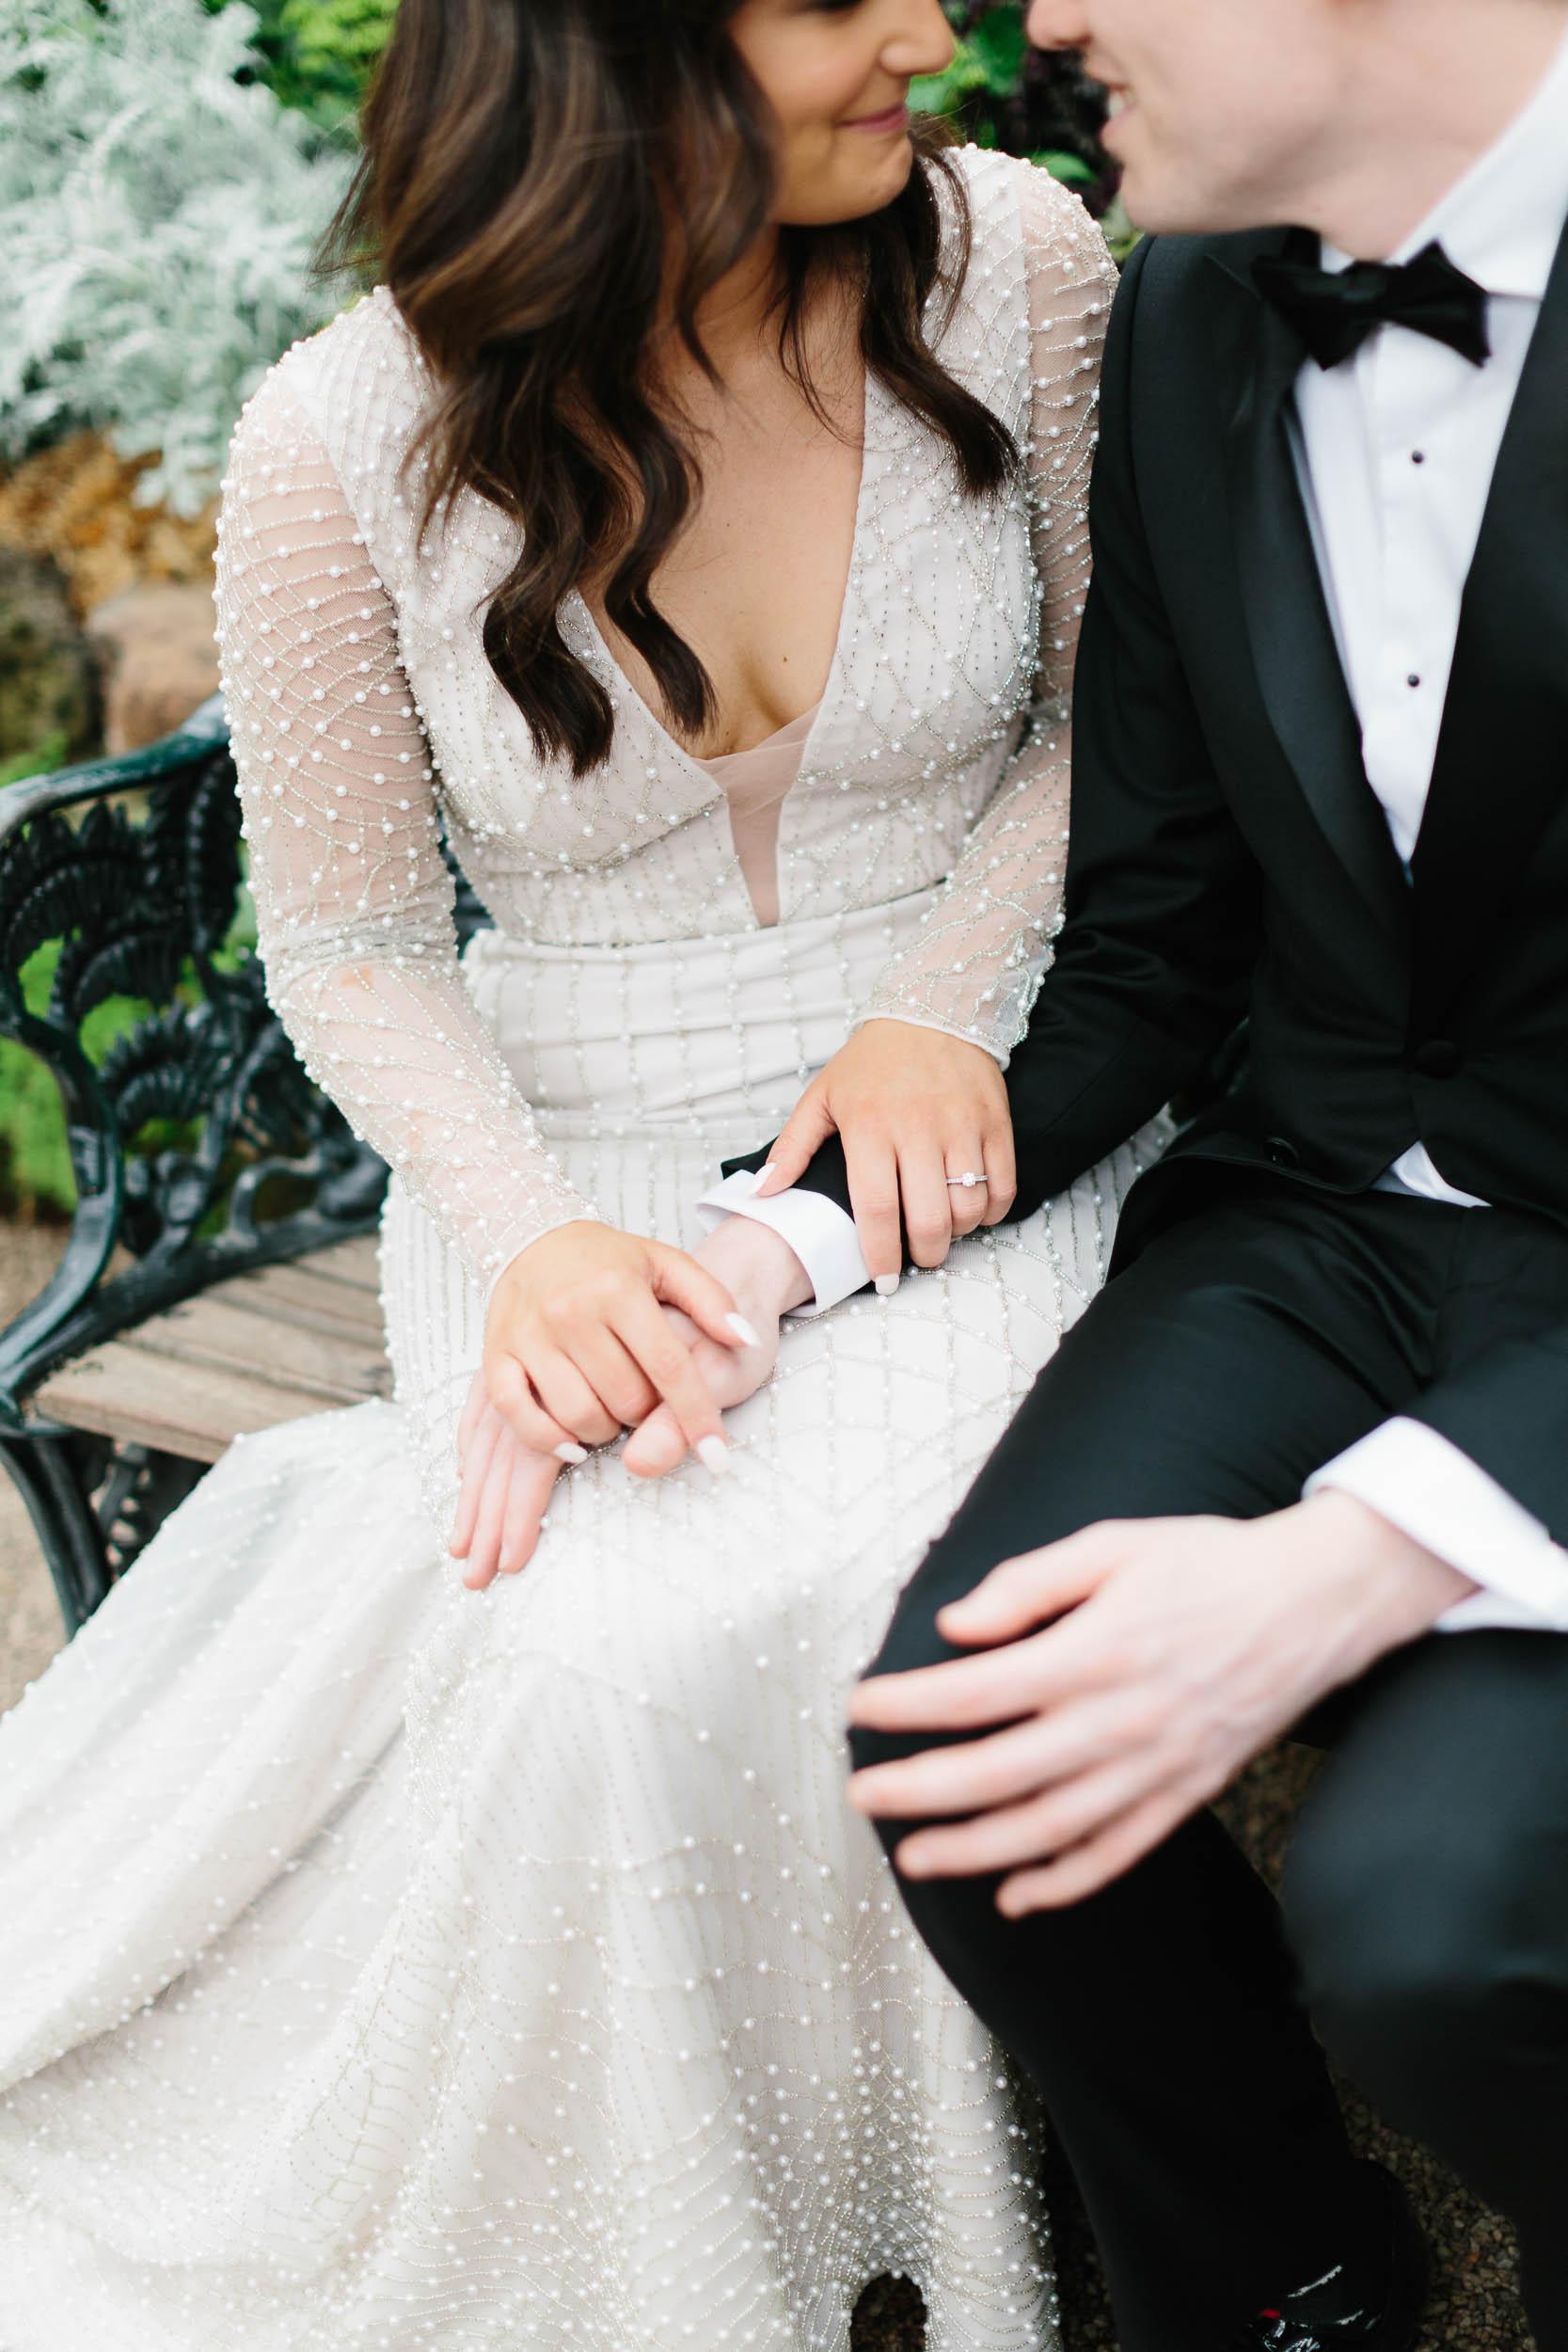 Kas-Richards-Wedding-Photographer-Melbourne-City-Wedding-Alto-Event-Space-Jane-Hill-Bridal-Gown-7.jpg